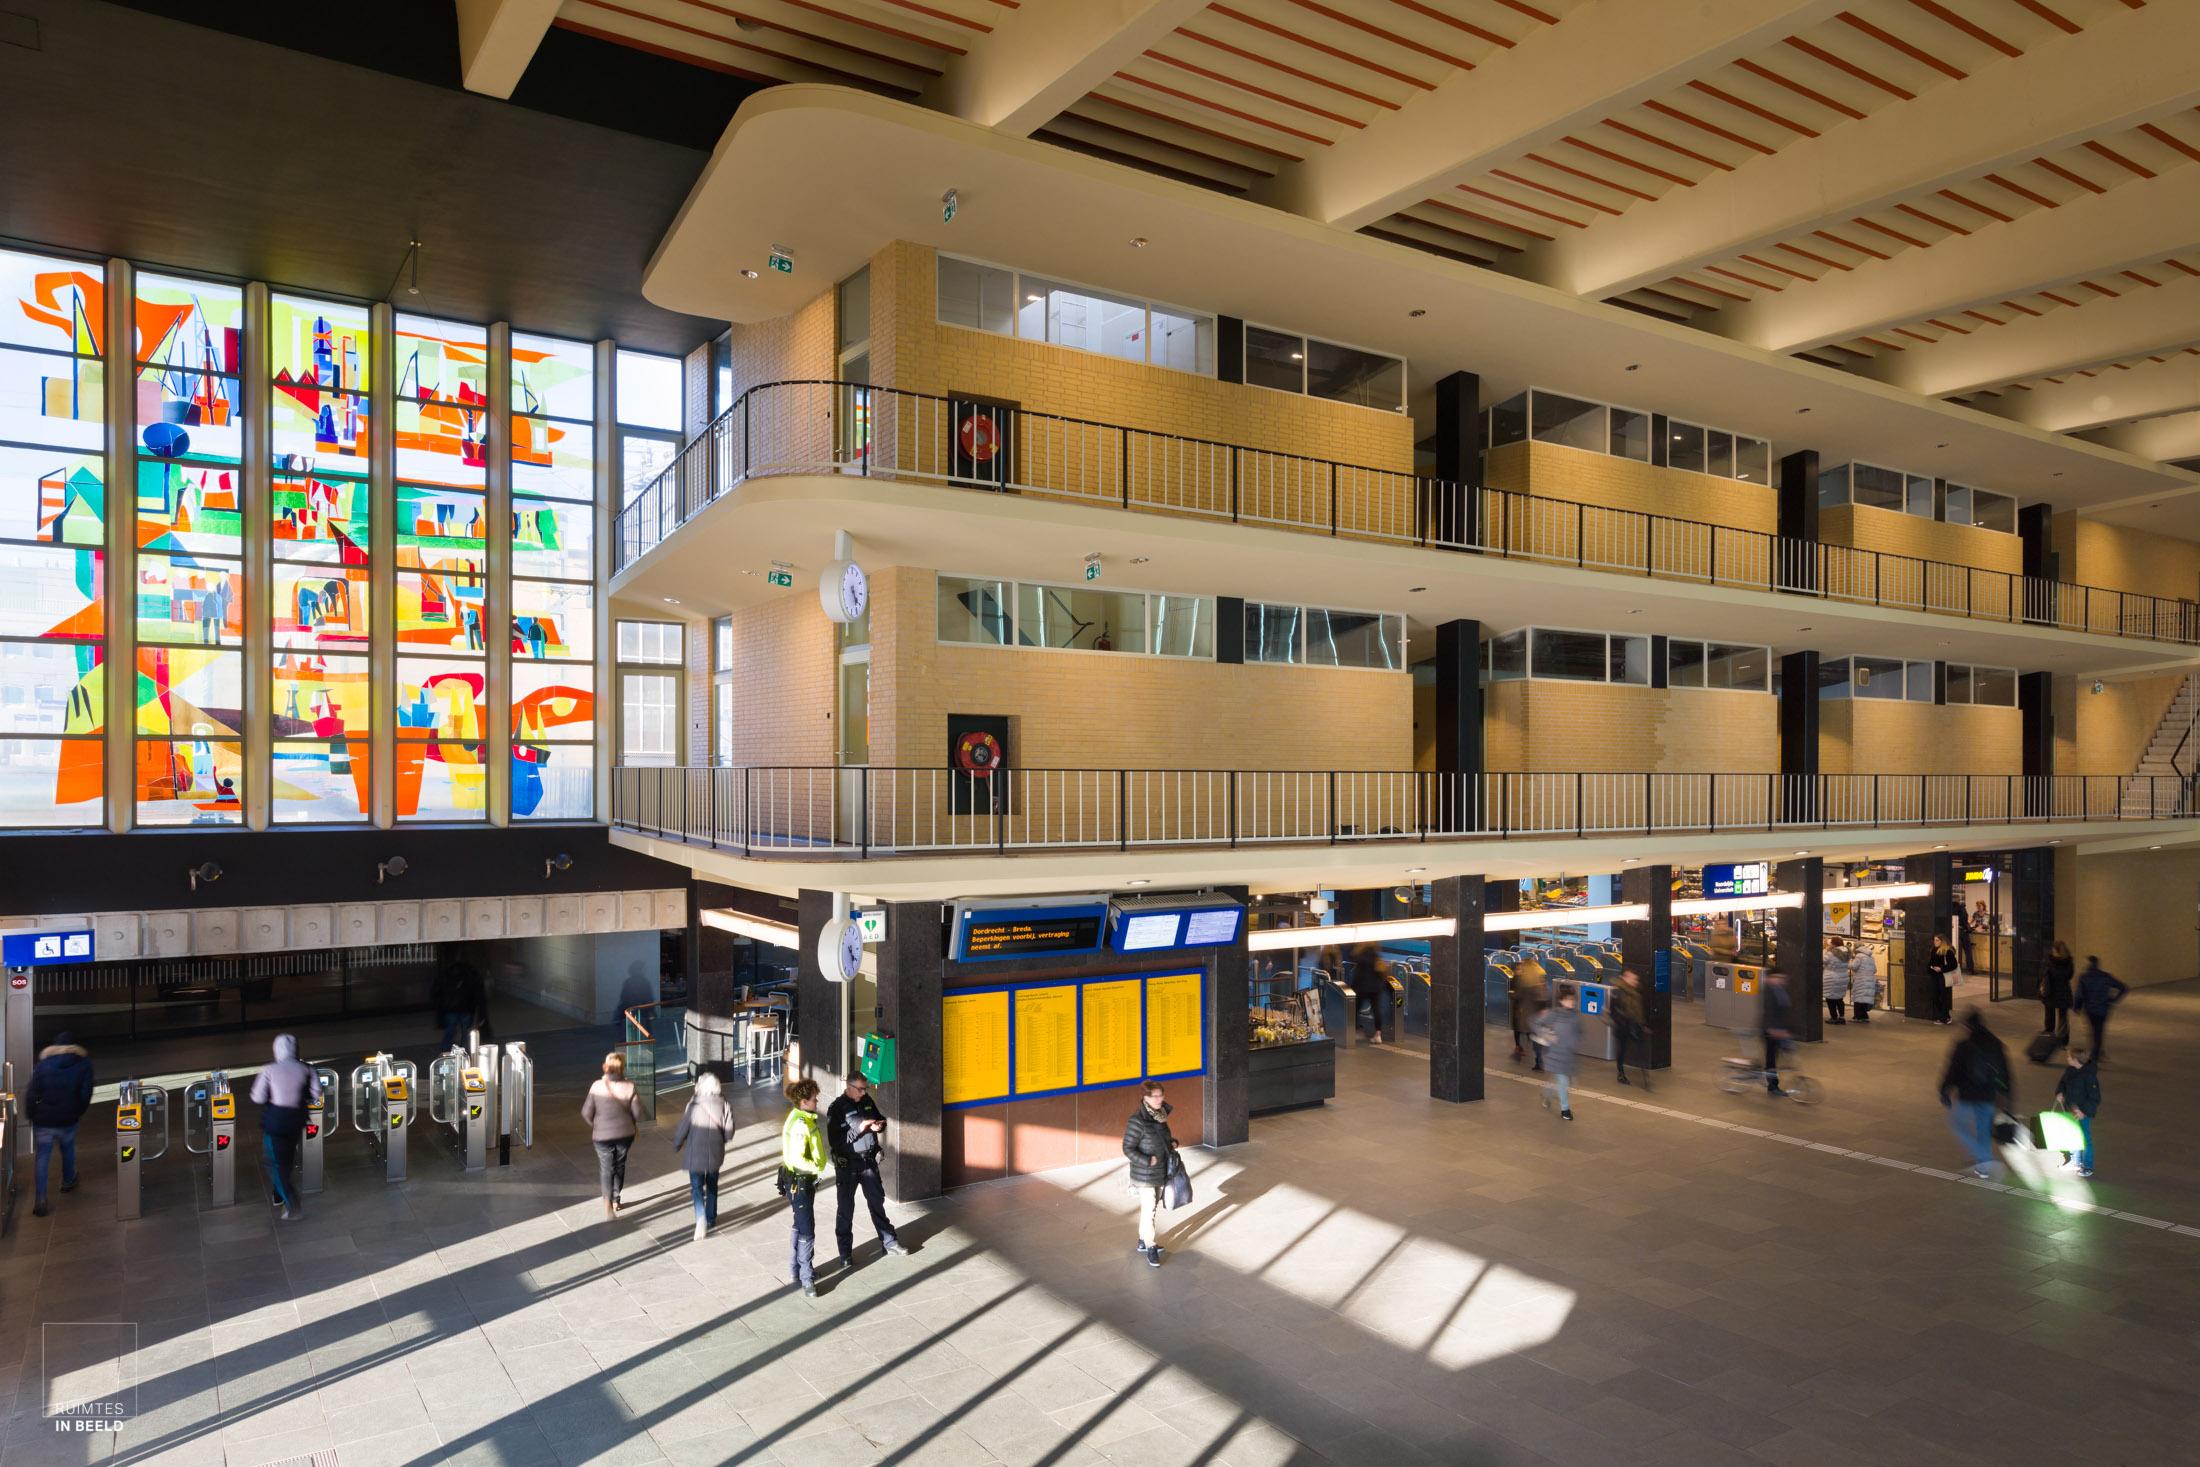 Station-Eindhoven-14.jpg